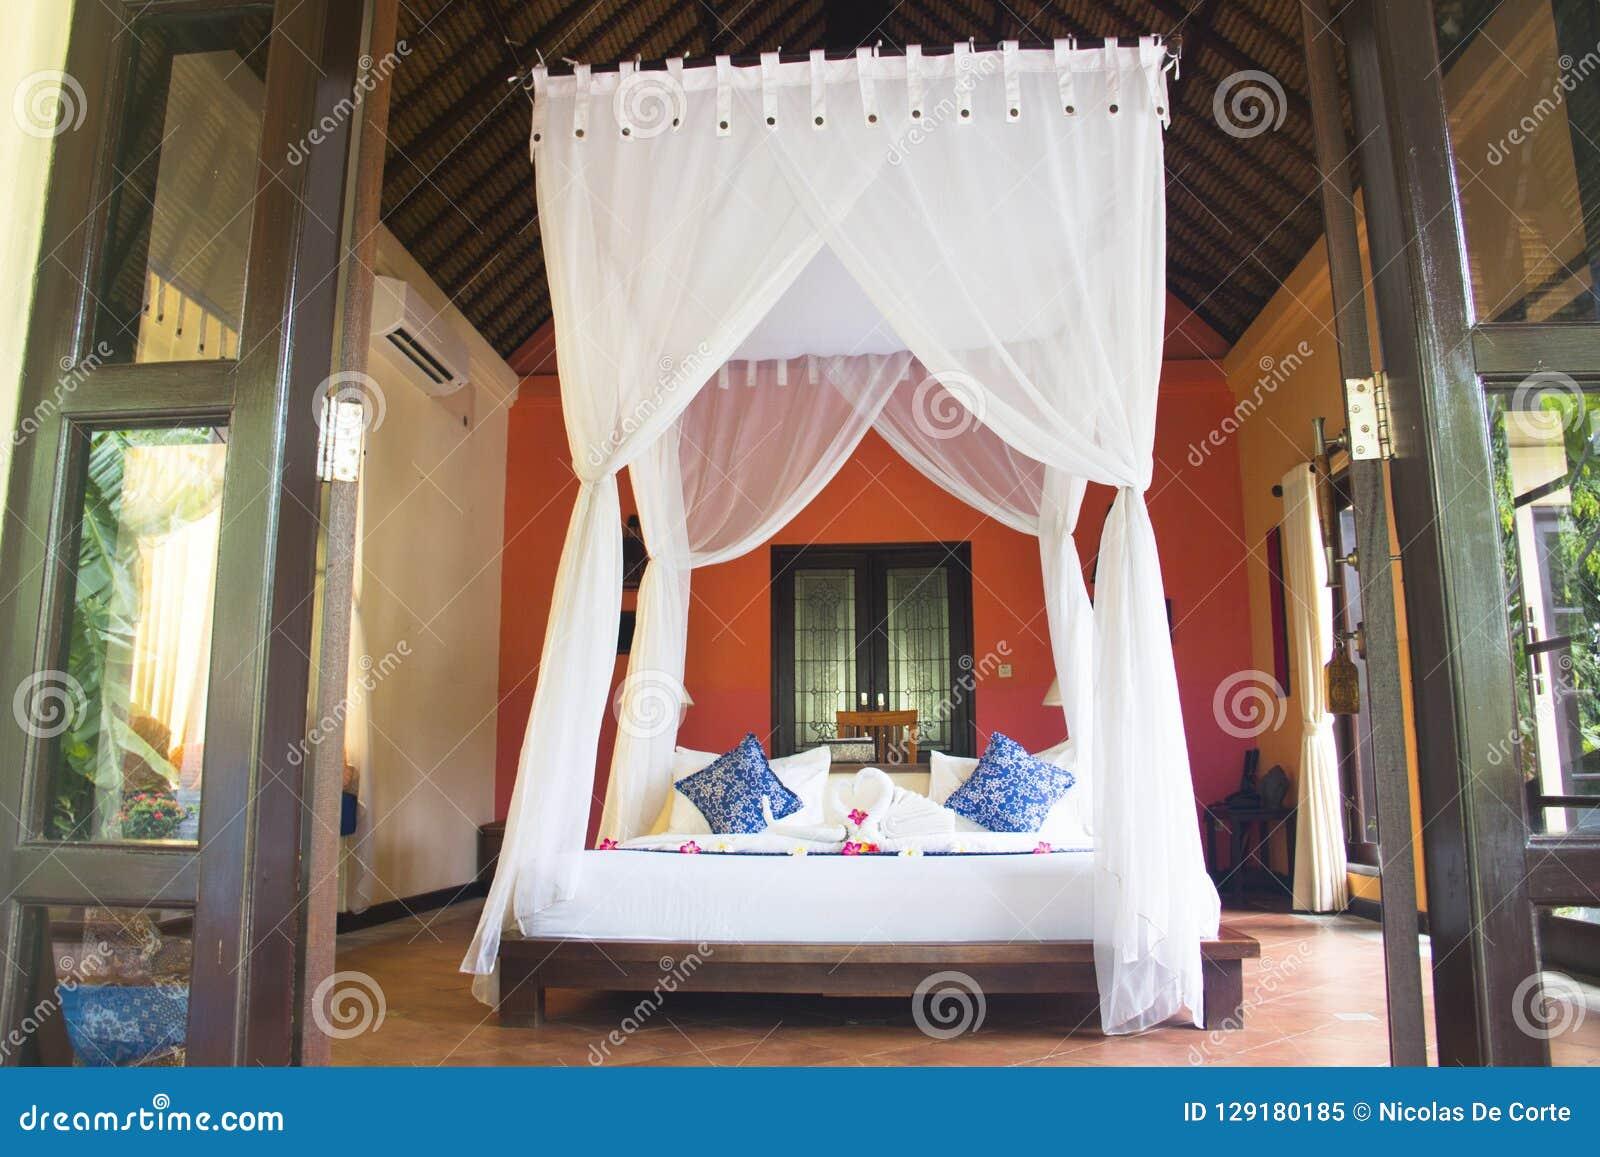 Fancy hotel room in Bali, Indonesia